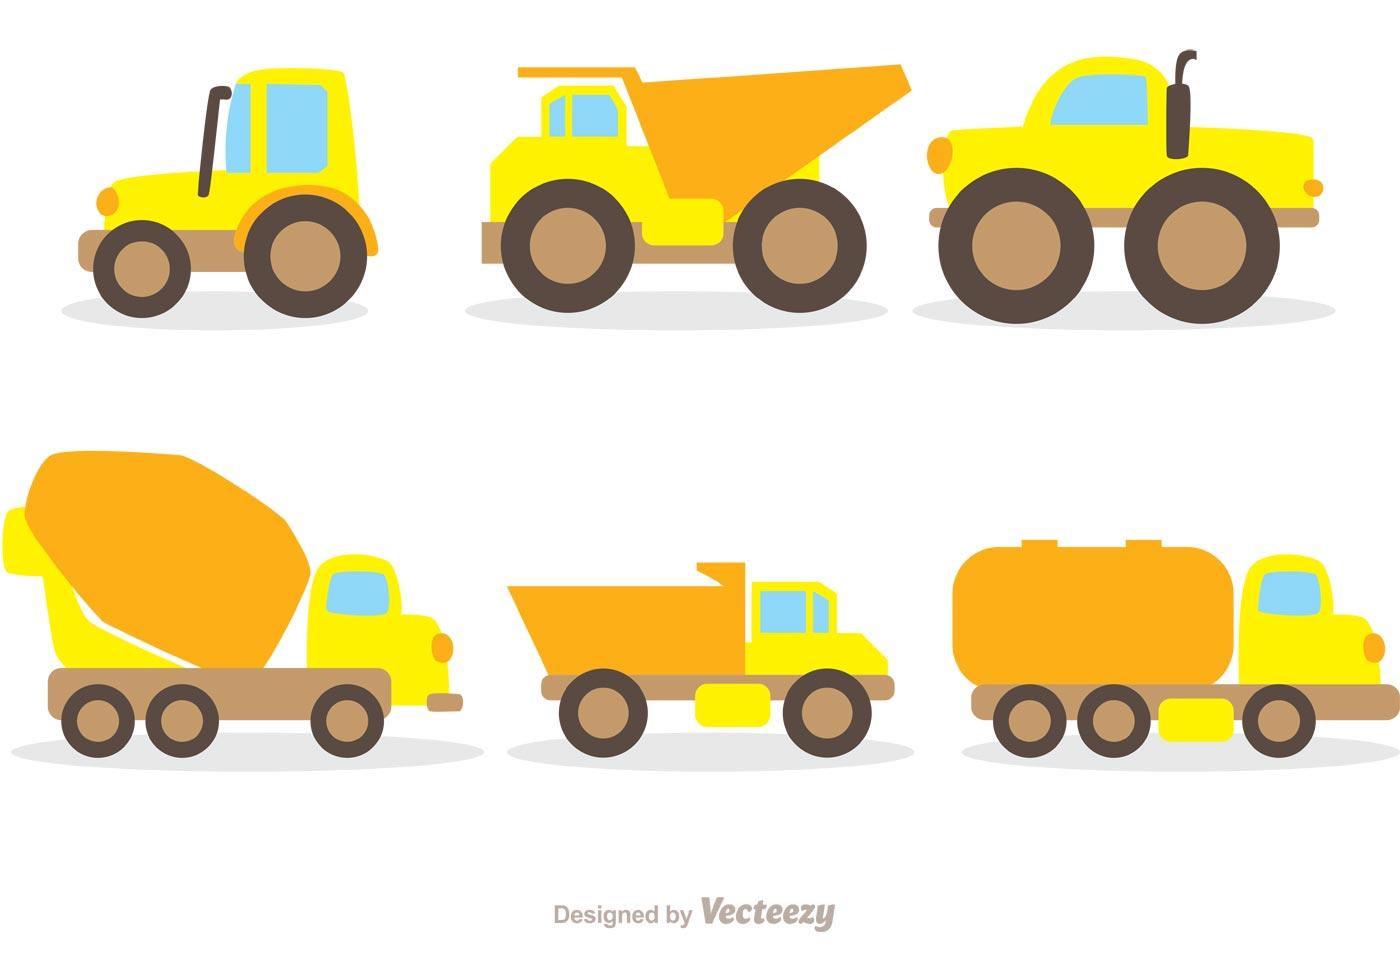 Truck png free download dump truck transparent png 1024x770.